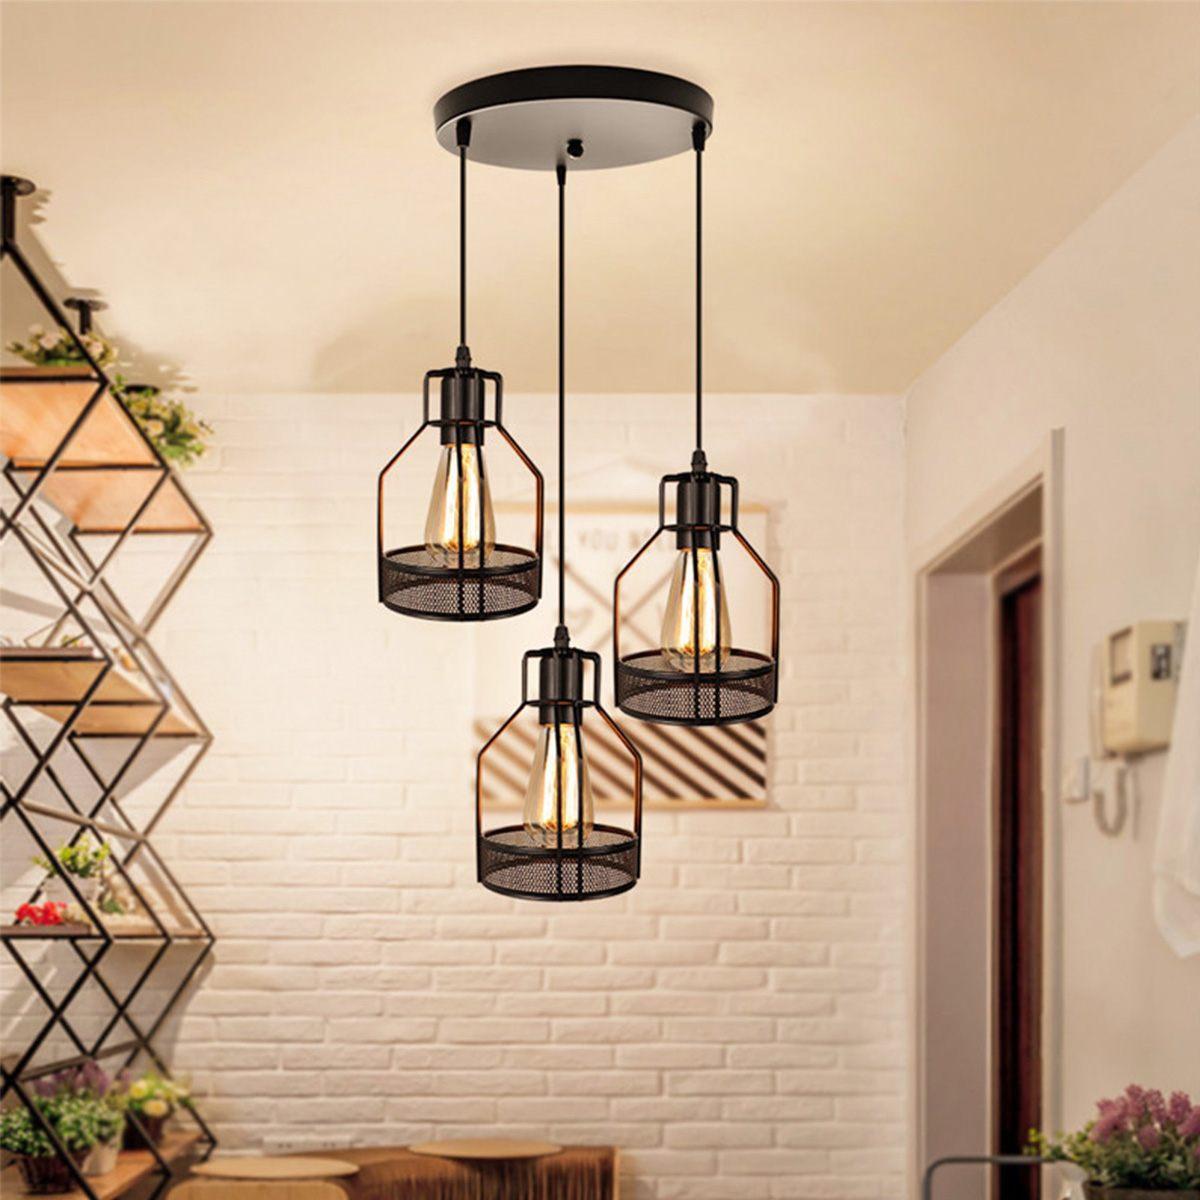 Vintage Industrial Pendant Light Iron Retro Loft Hanging Lamp For Living Room Kitchen Cafe Bar Home Light Fixtures